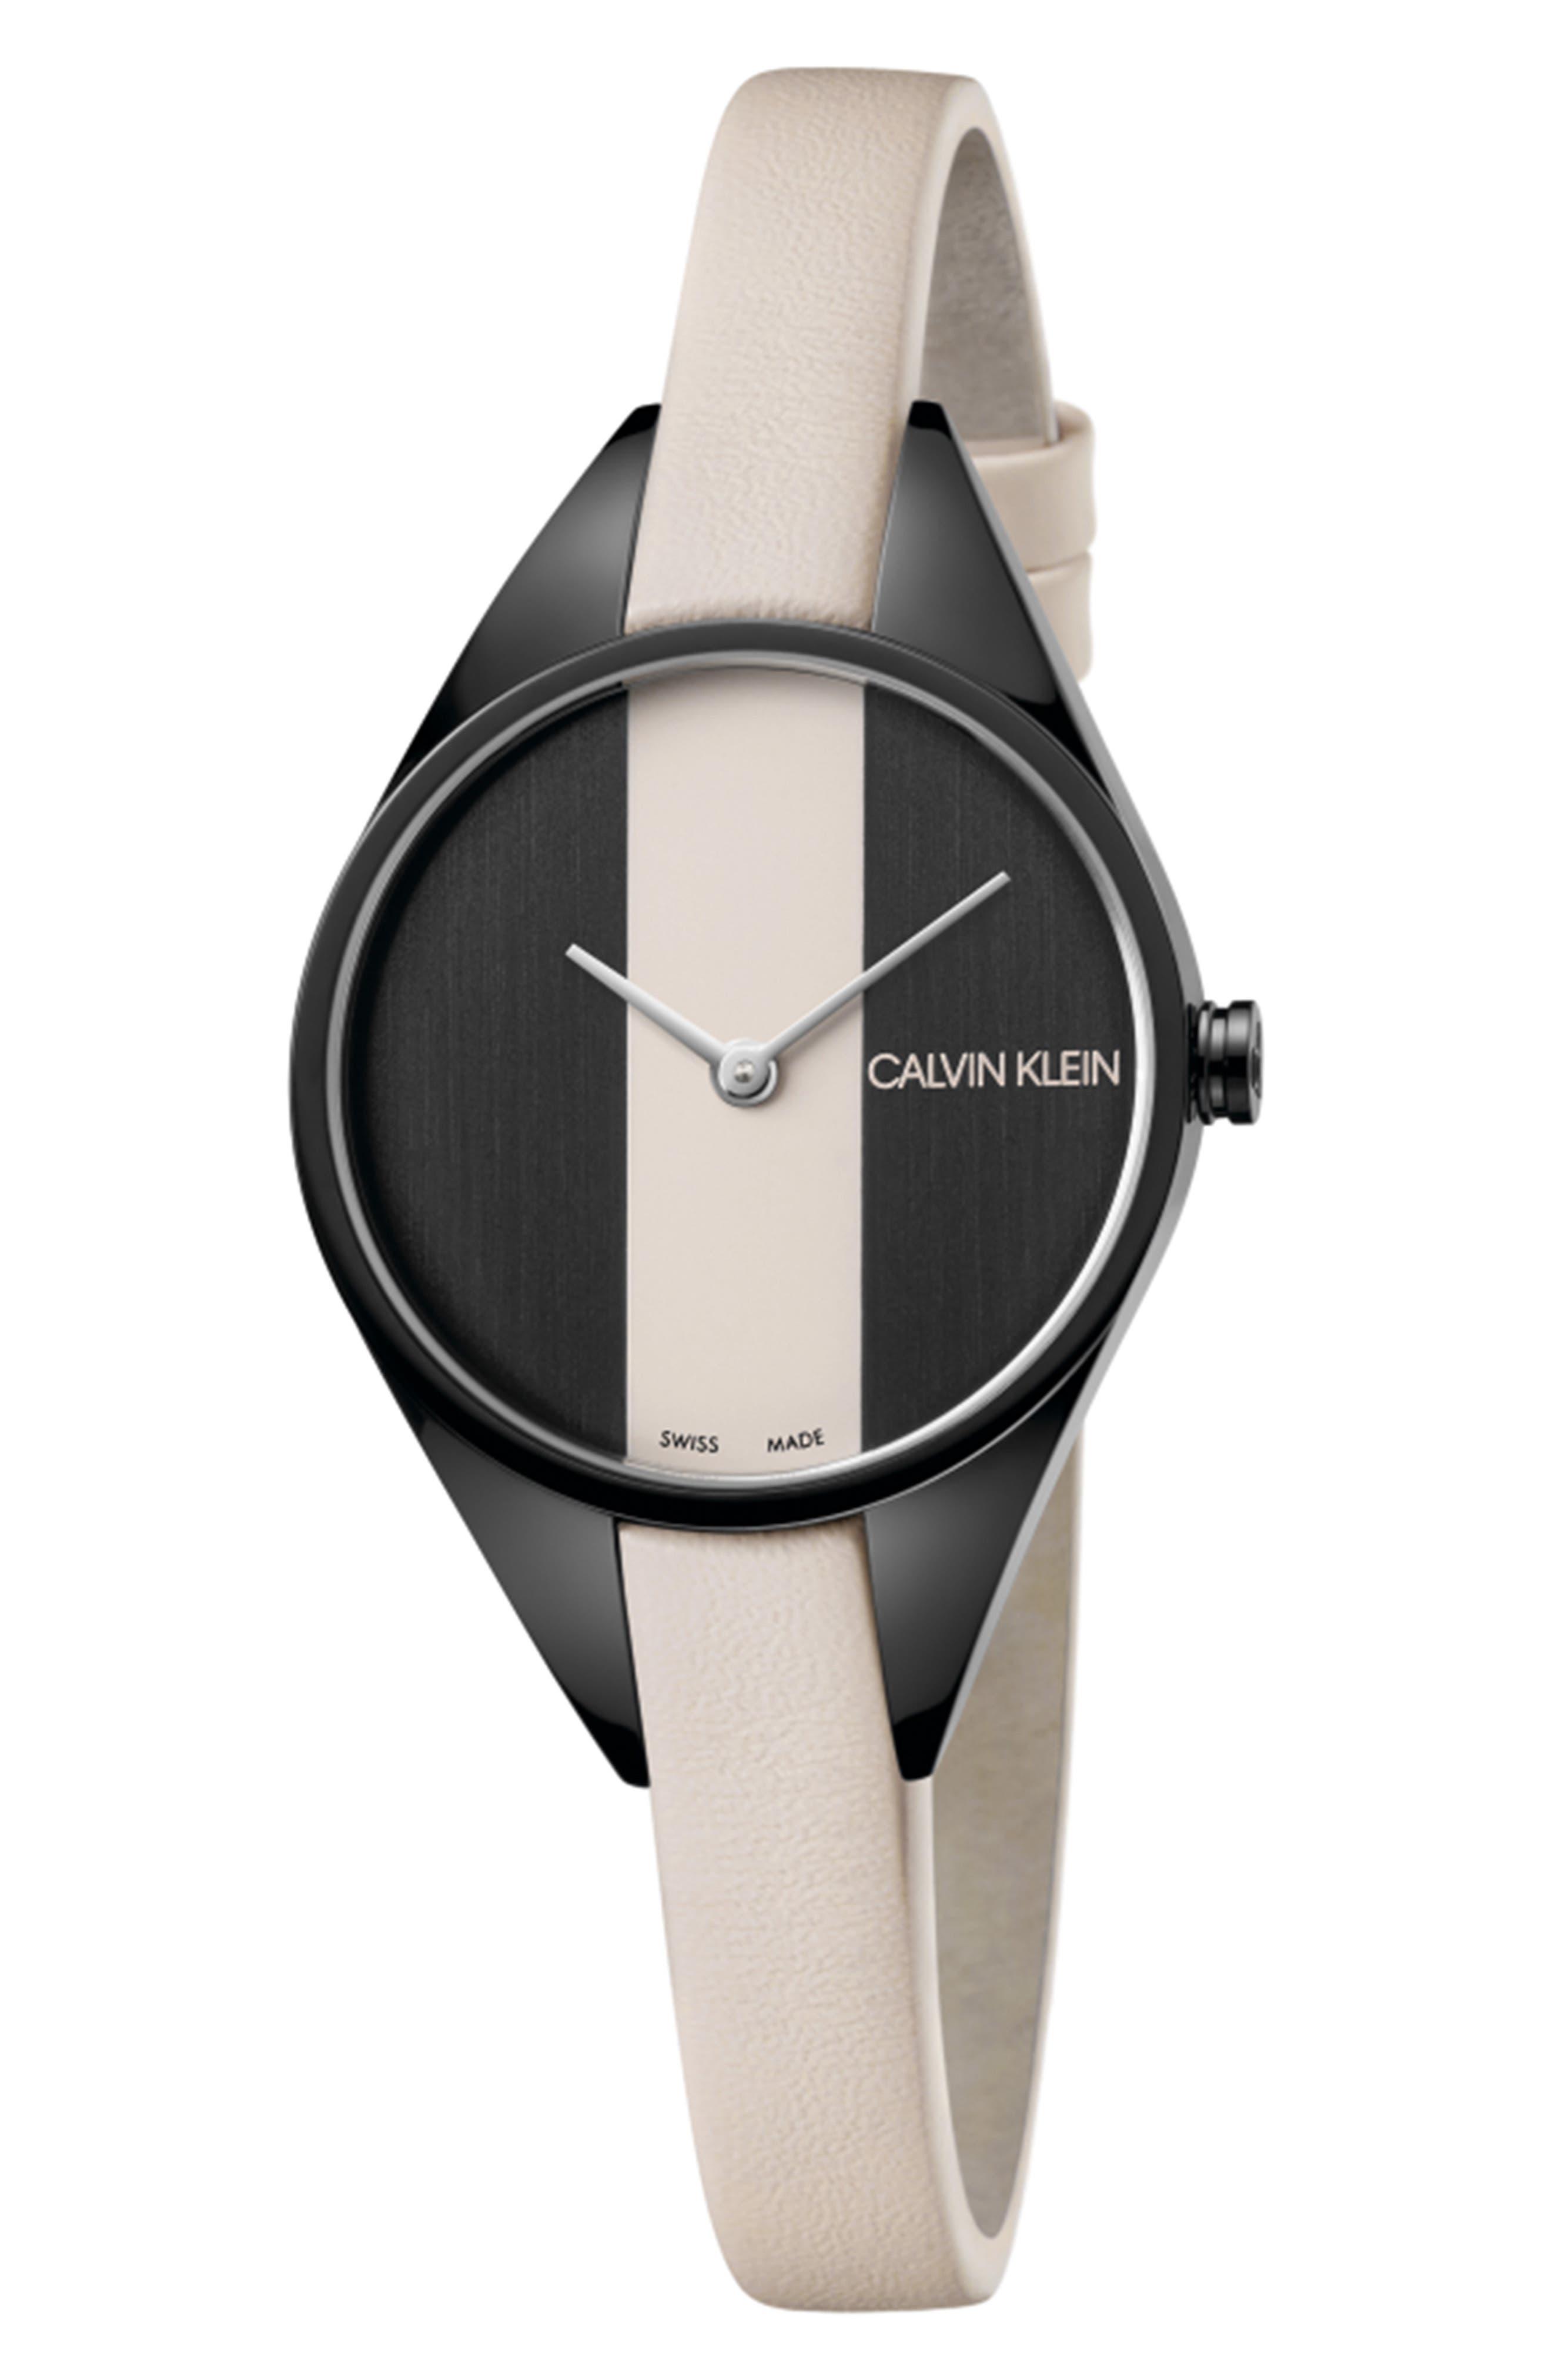 CALVIN KLEIN Achieve Rebel Leather Band Watch, 29mm, Main, color, CREAM/ BLACK